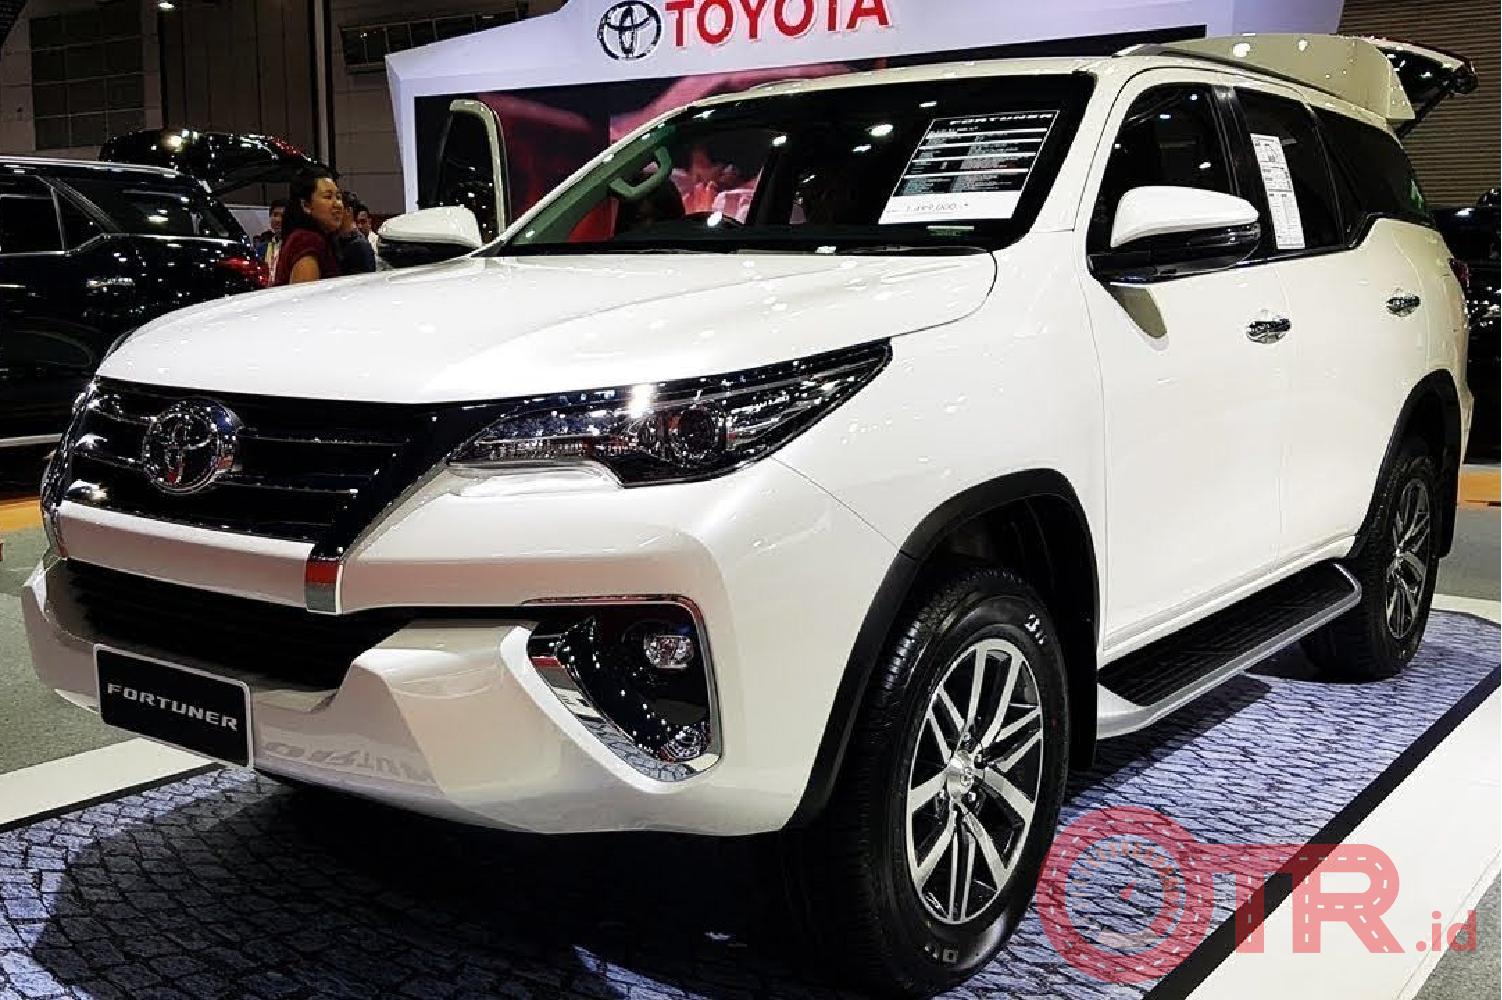 Toyota Fortuner OTR.id